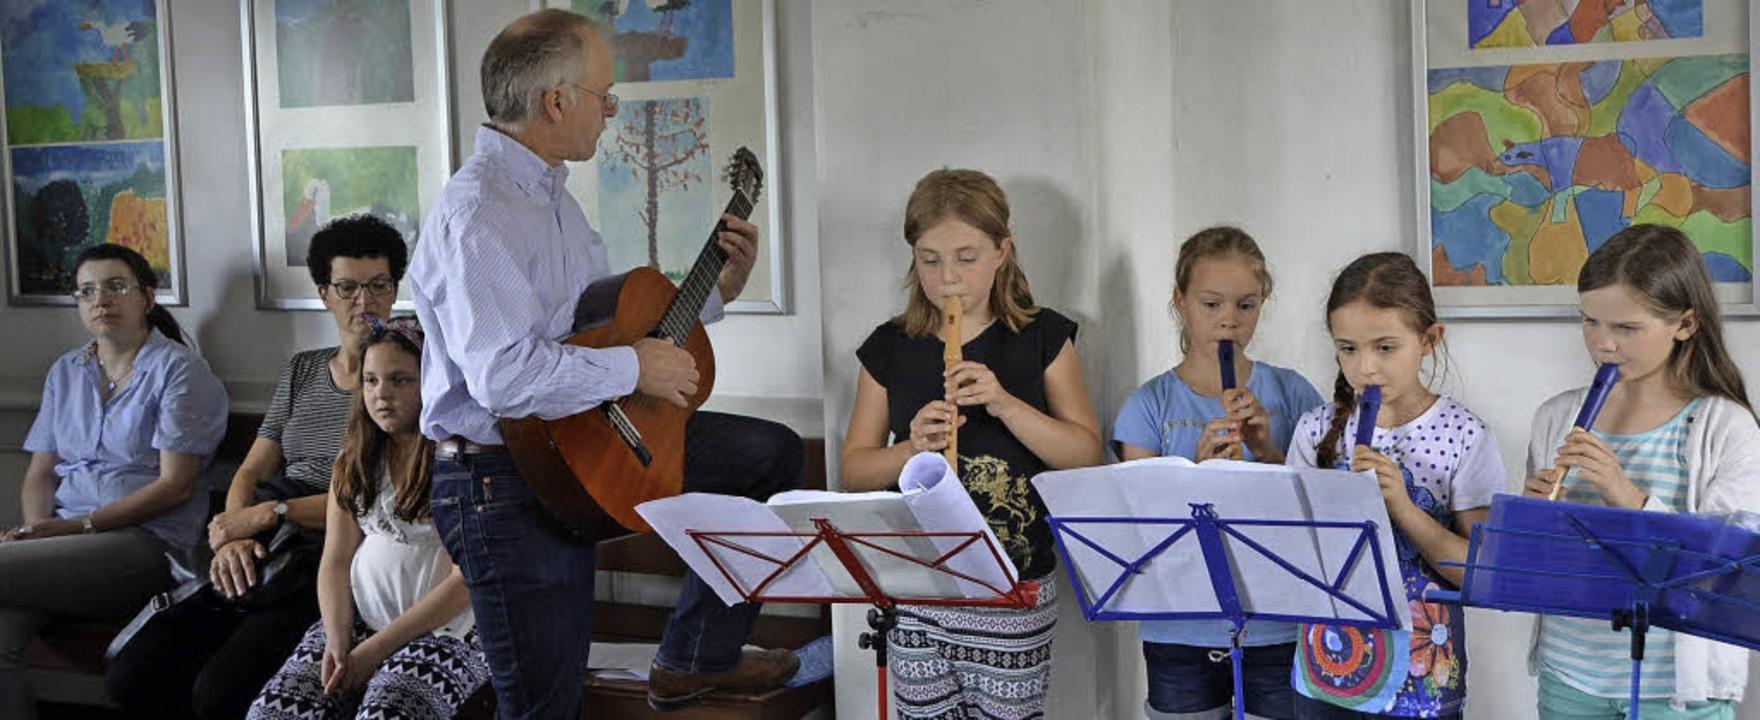 Mit Musik wurde im Wartesaal im Bahnho...n der Michaelschule Oberried eröffnet.    Foto: Katja Marré